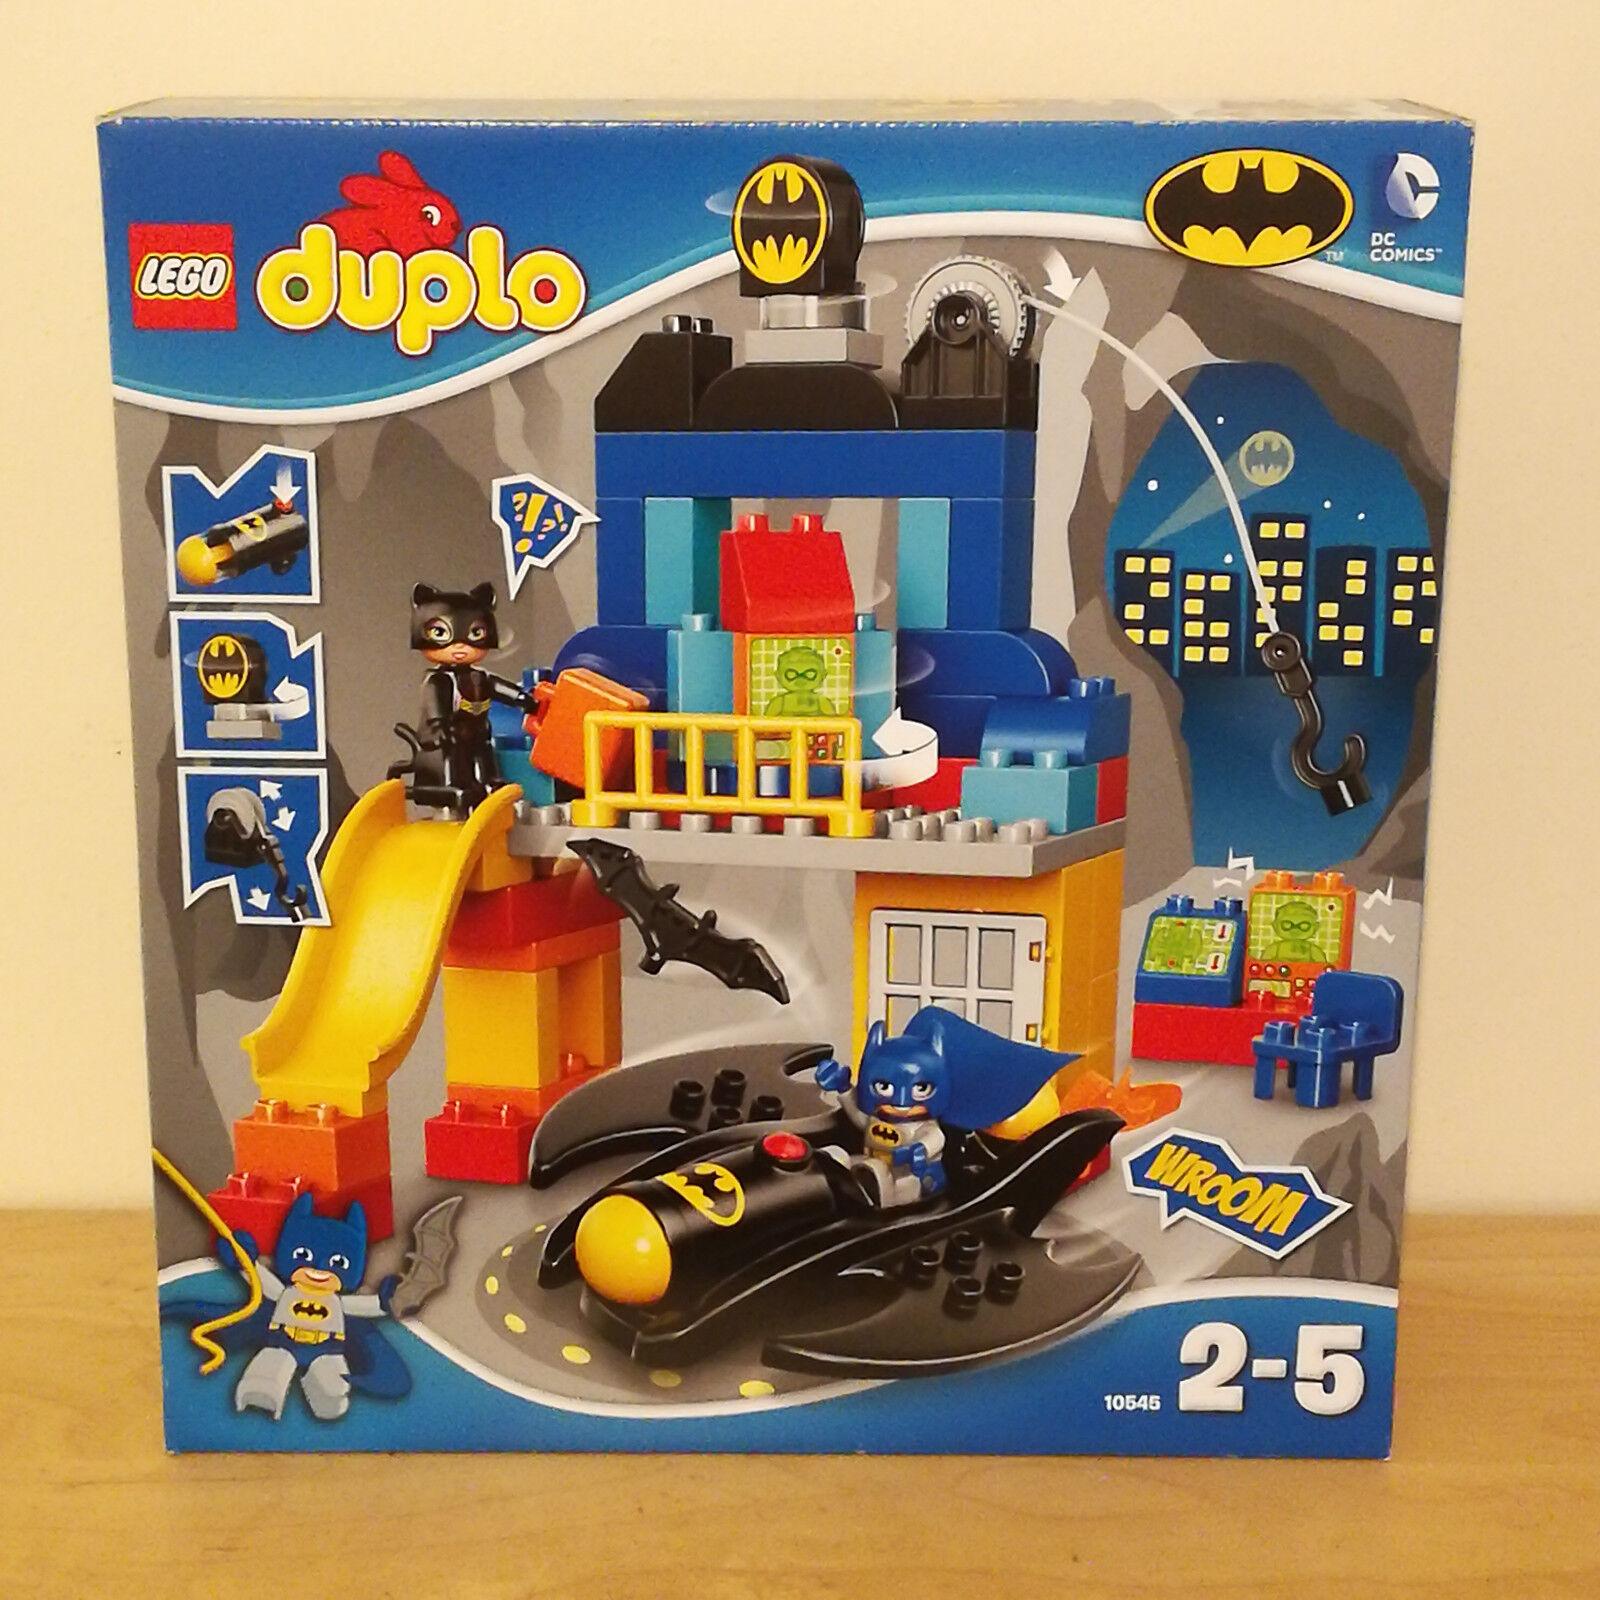 LEGO Duplo Duplo Duplo 10545 BATCAVE ADVENTURE - Brand new includes Catwoman & Batwing f3c2c5